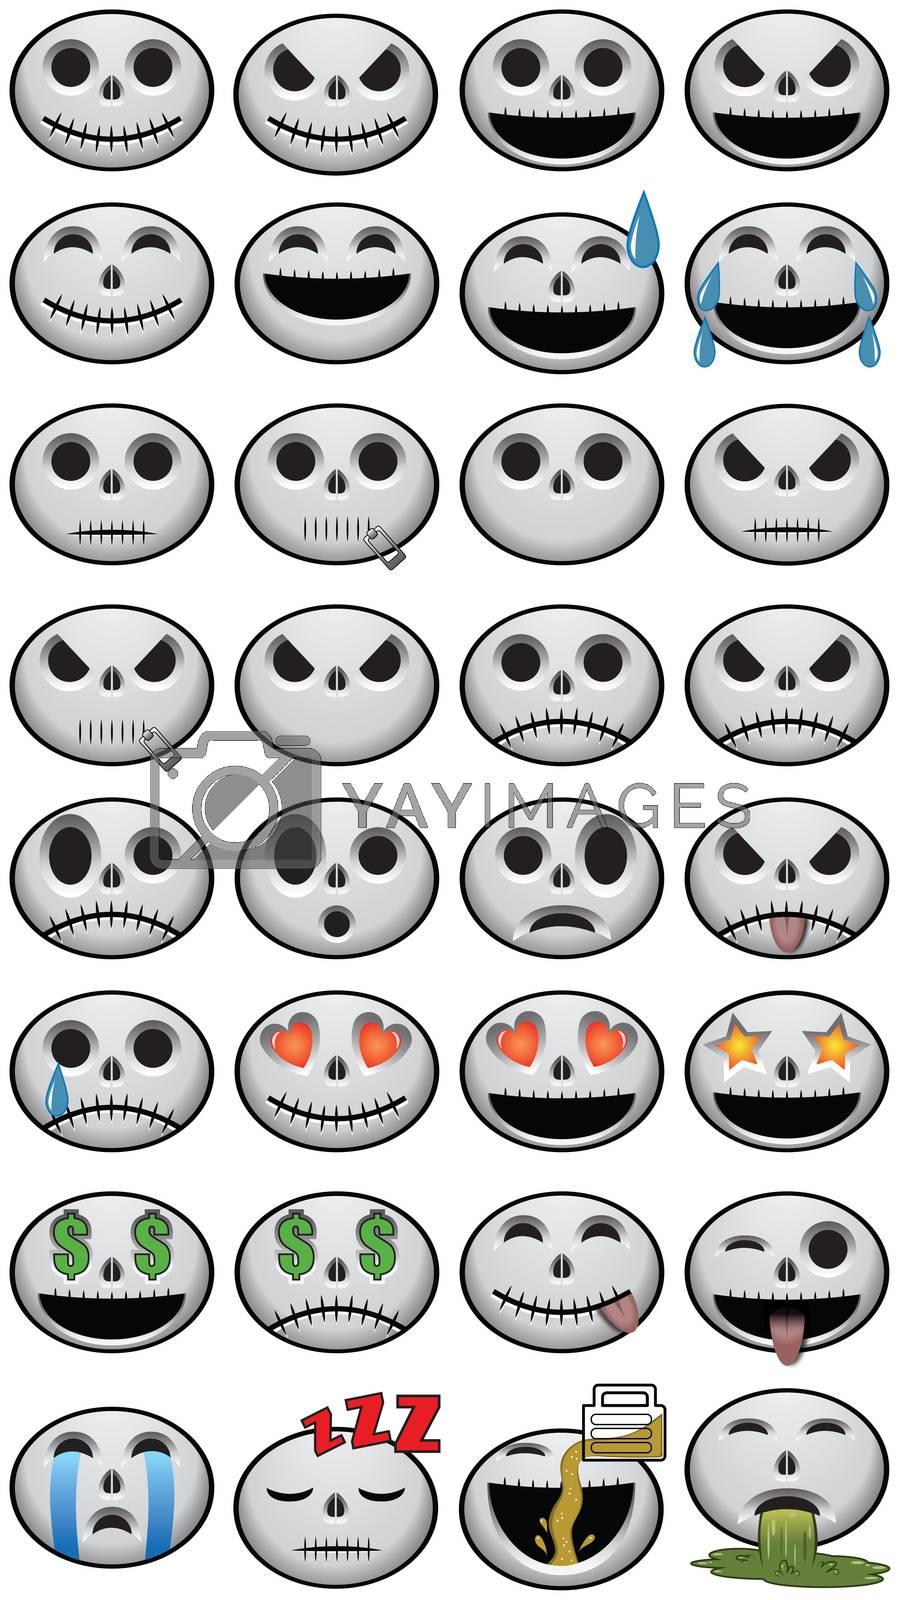 Thirty-two 32 Halloween Skull Emojis social media icon faces of emotion skulls